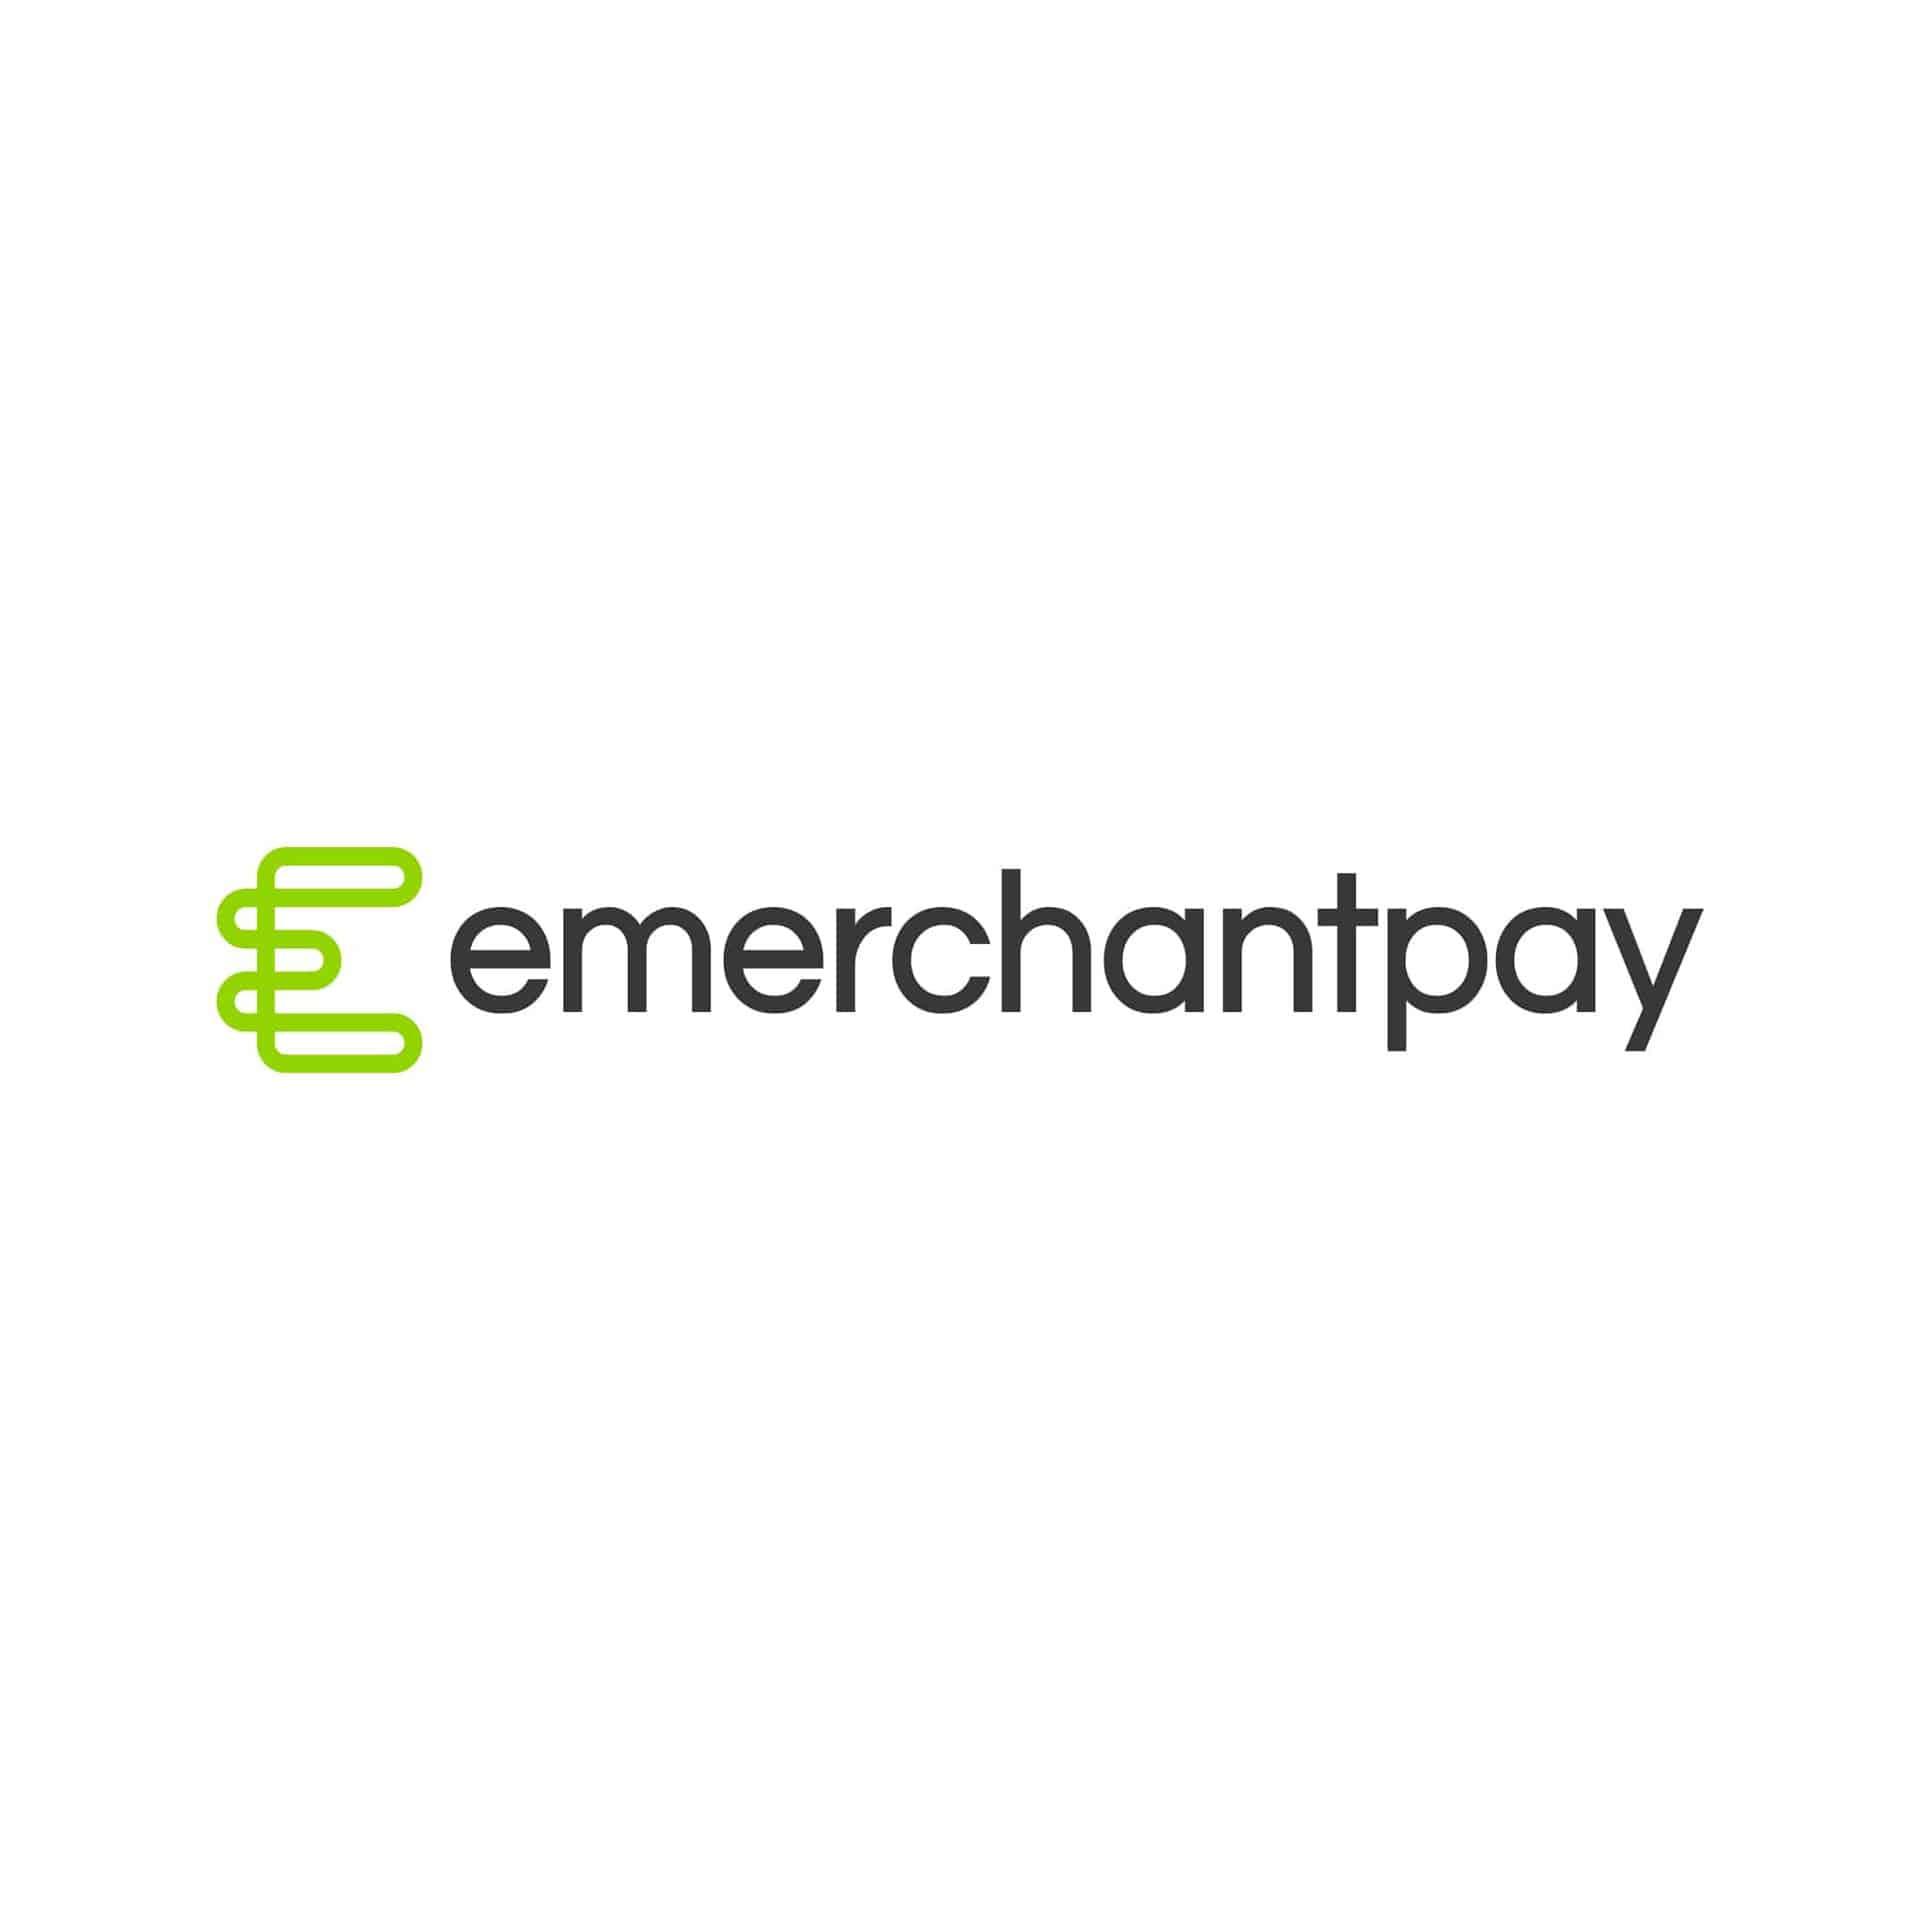 emerchantpay brand identity